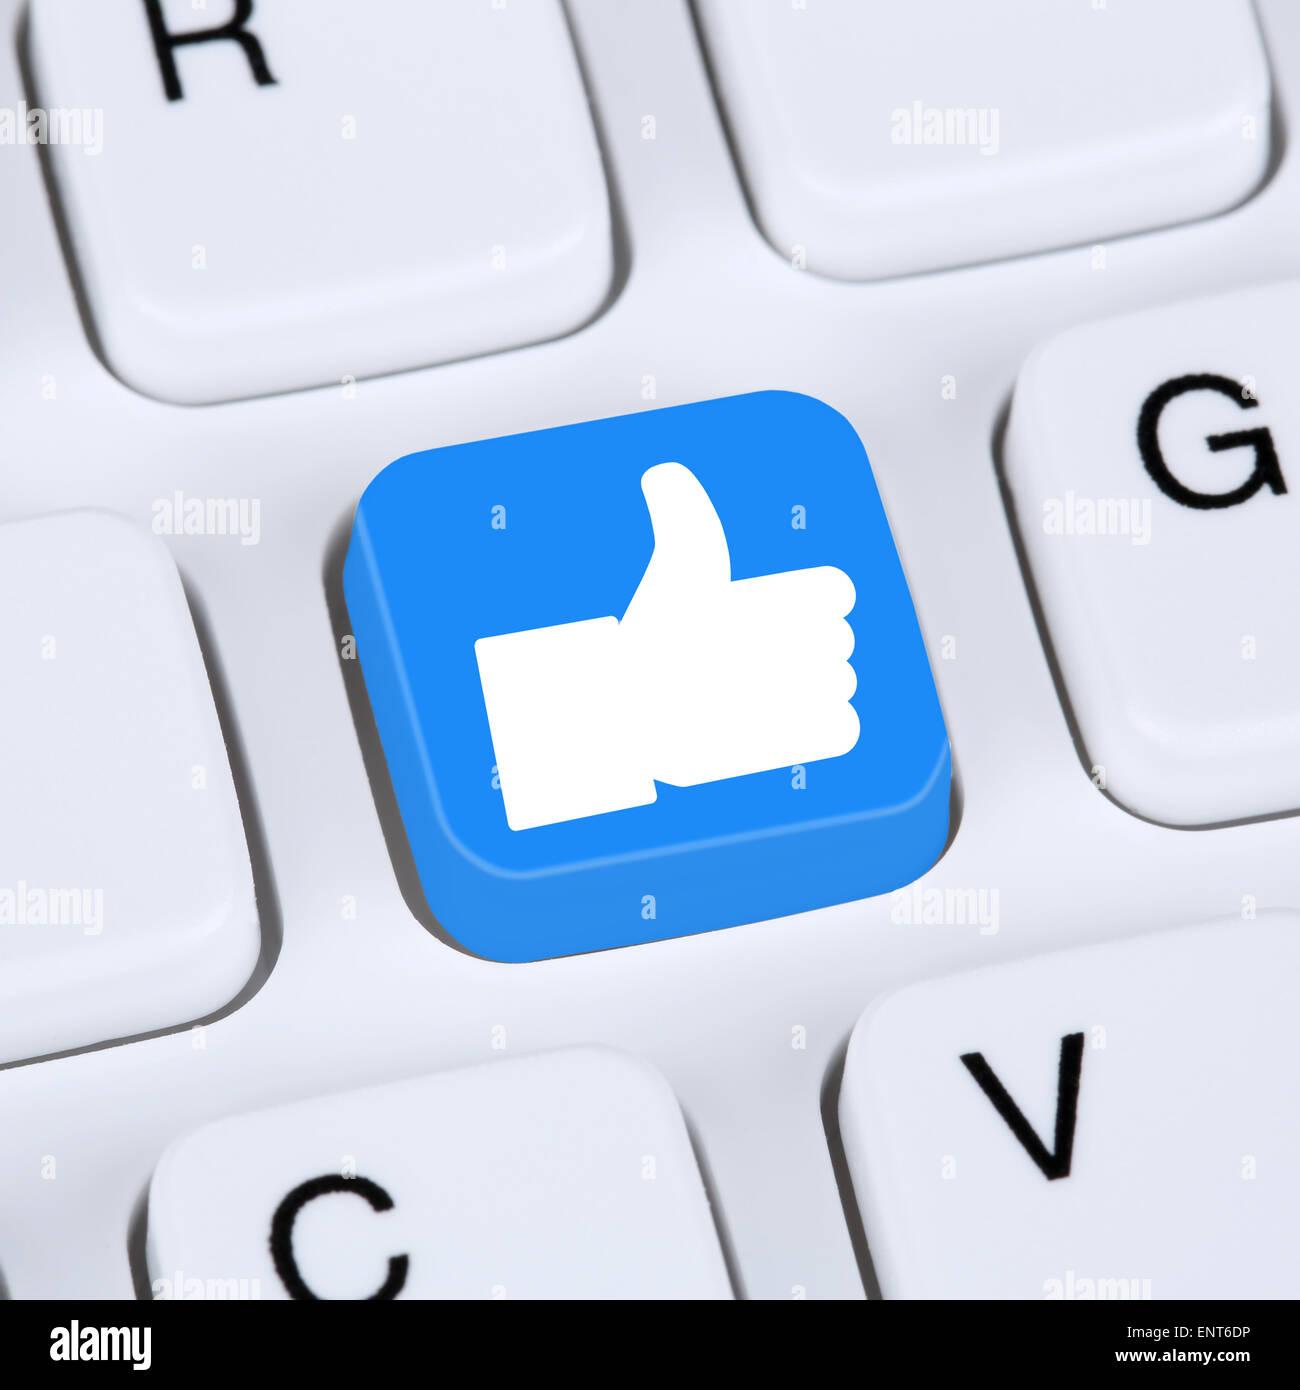 Concepto de Internet como símbolo de icono de botón de pulgar arriba los medios de comunicación social Imagen De Stock